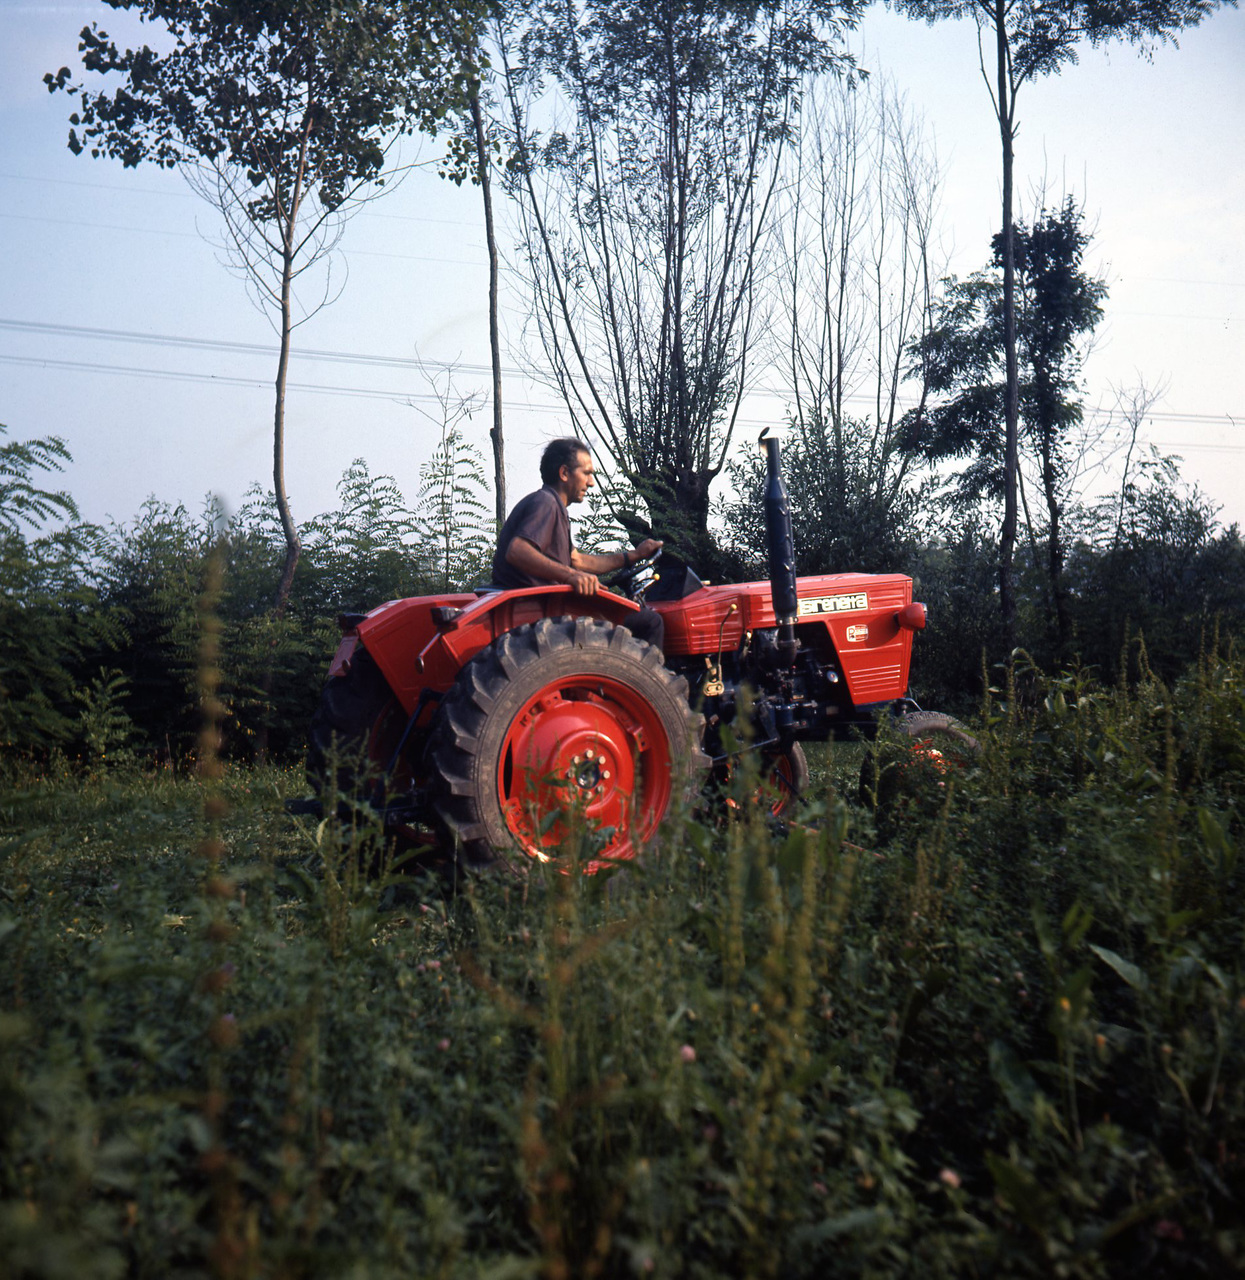 [SAME] Sirenetta 2RM presso Az. Luigi Nicodemo di Teglio Veneto (Venezia) - 15/7/1972